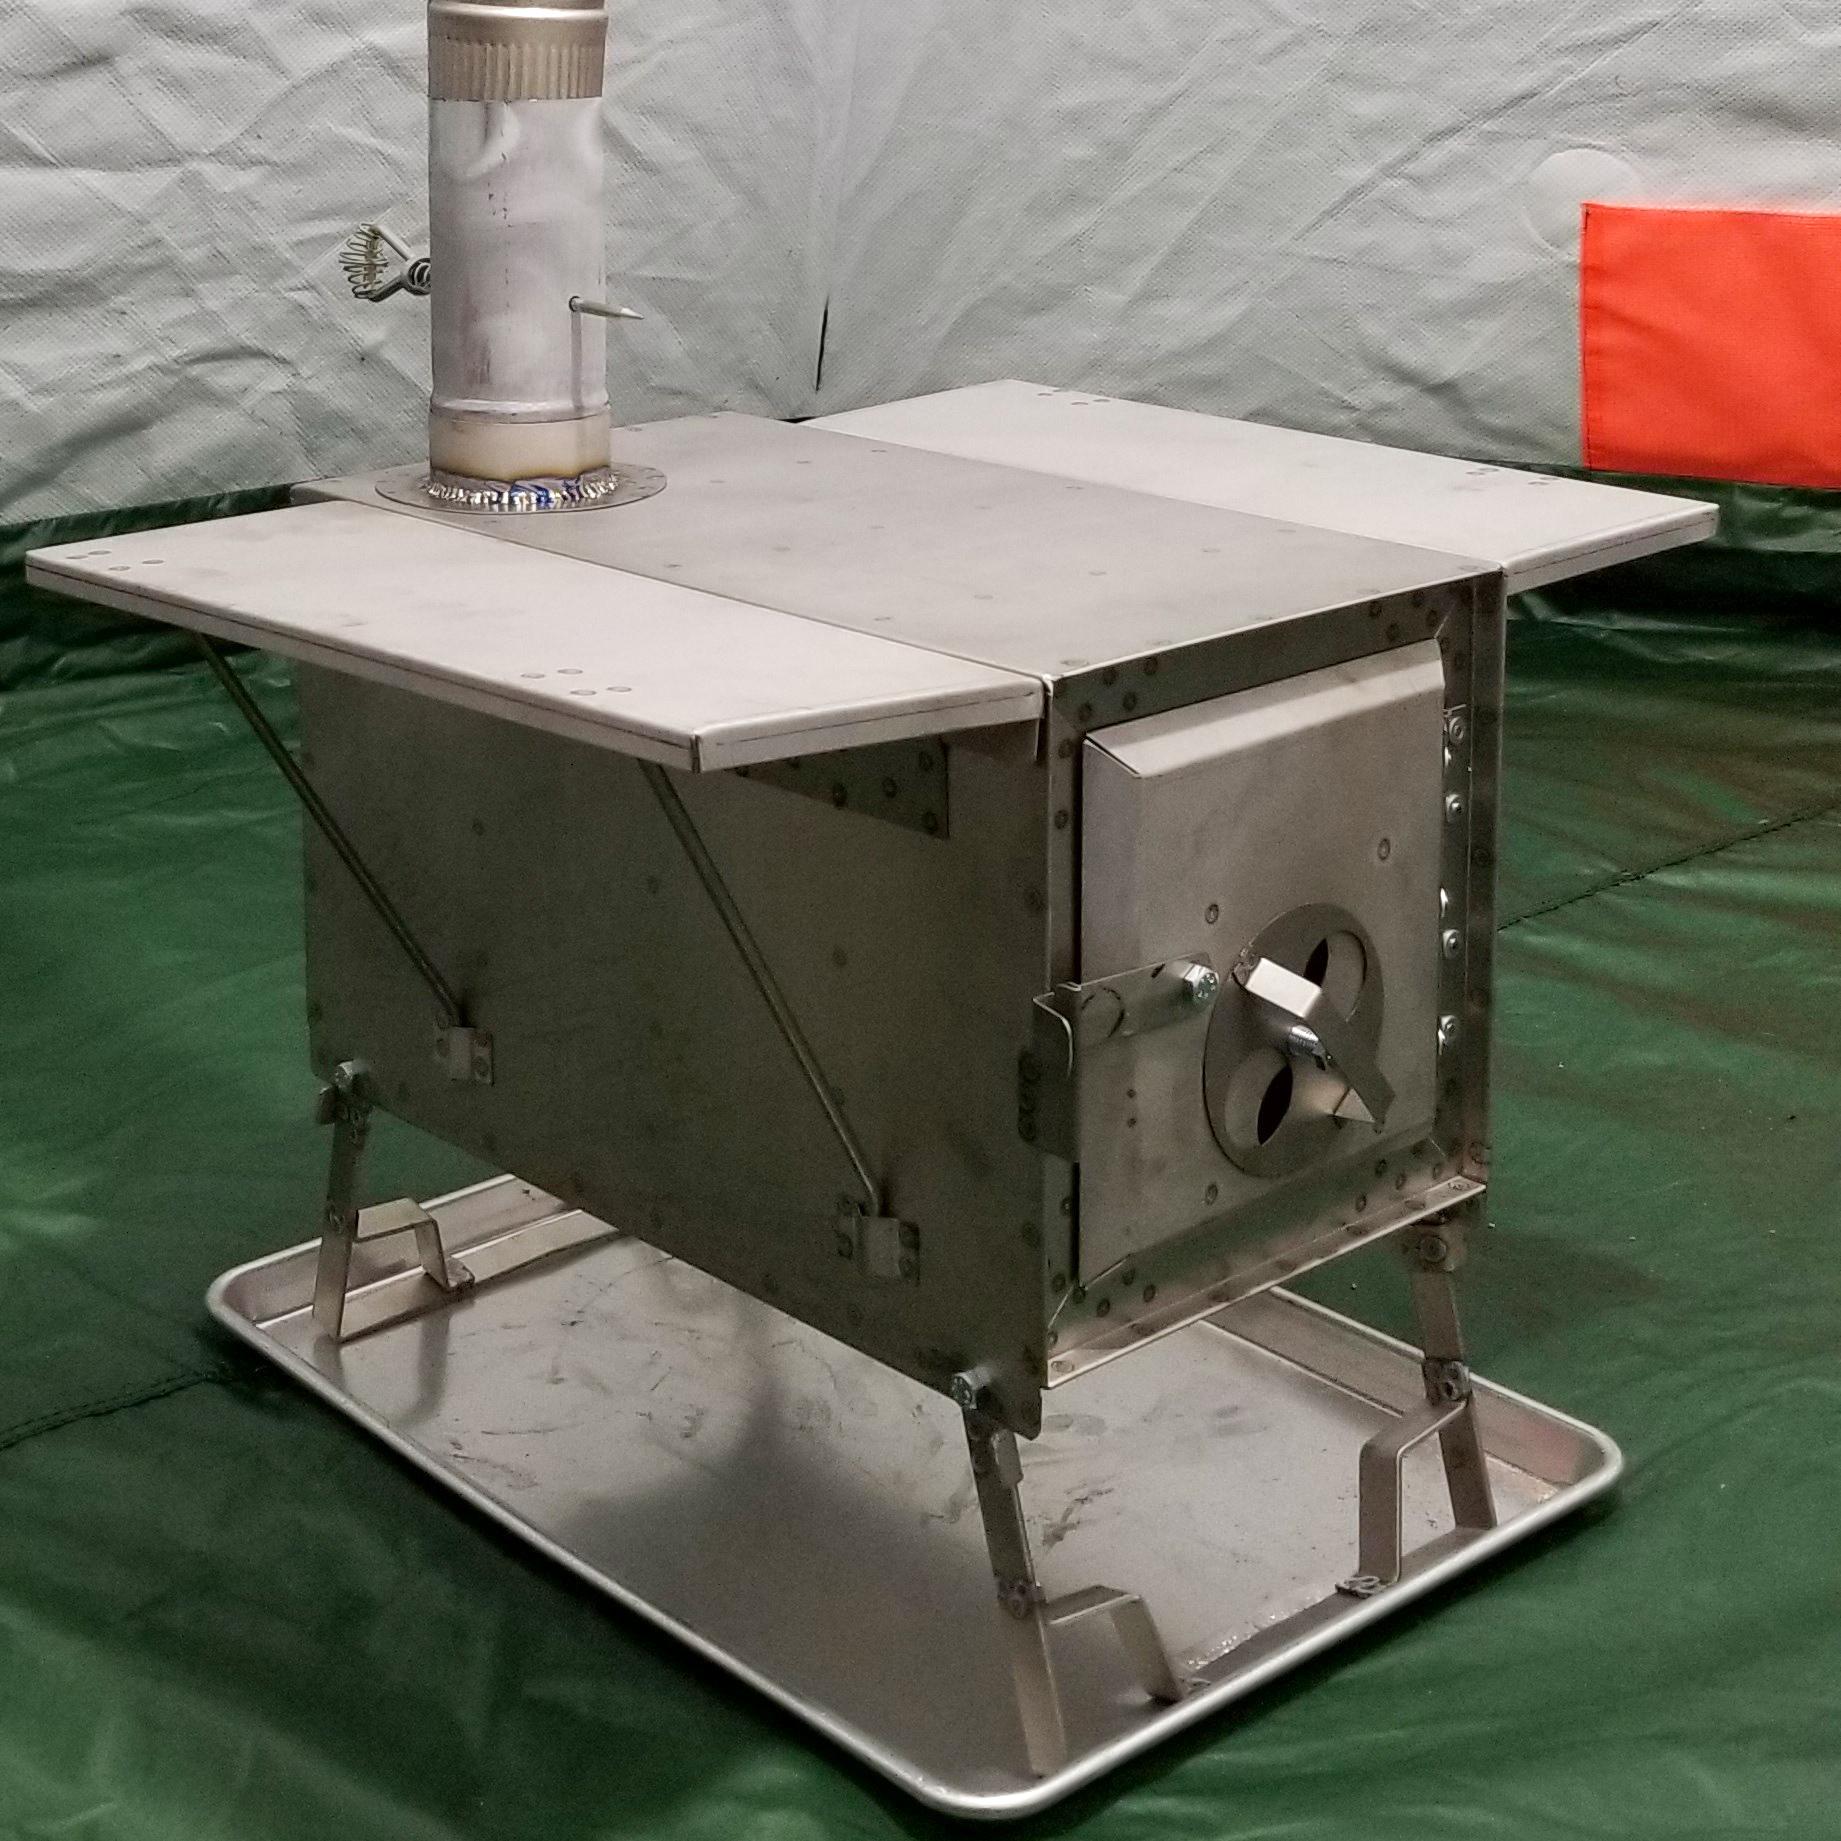 The Four Dog Titanium Ultra Lite 1DX hunting stove